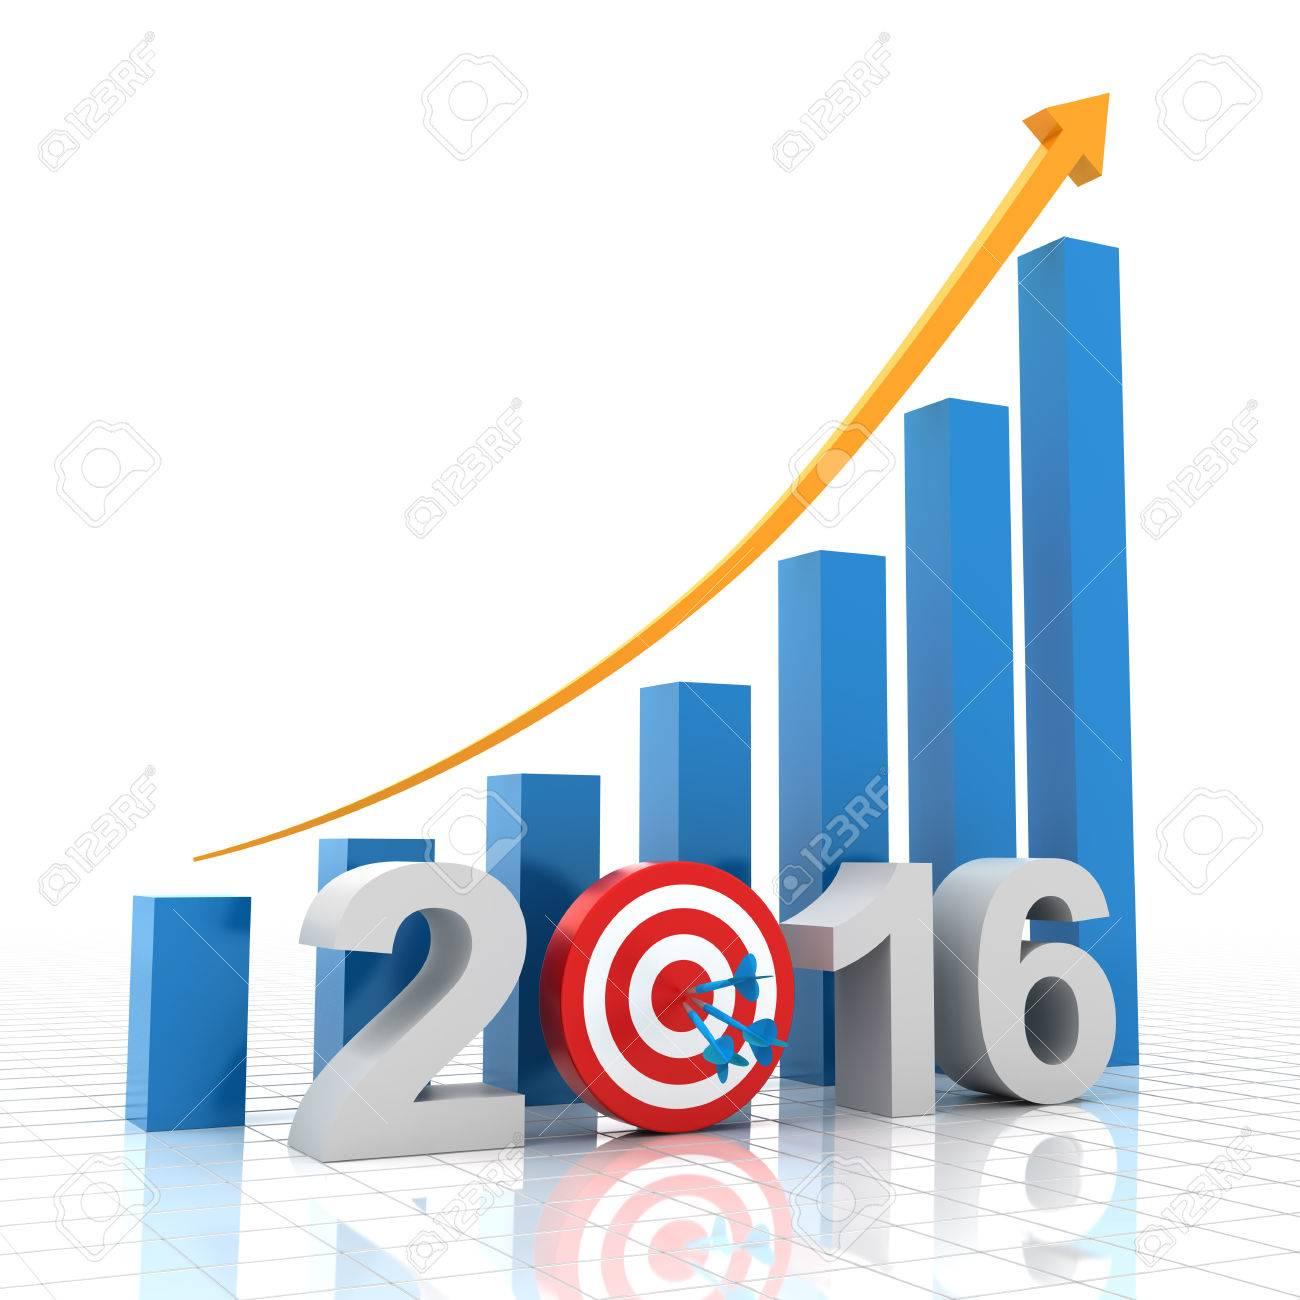 2016 growth target, 3d render, white - 43541739